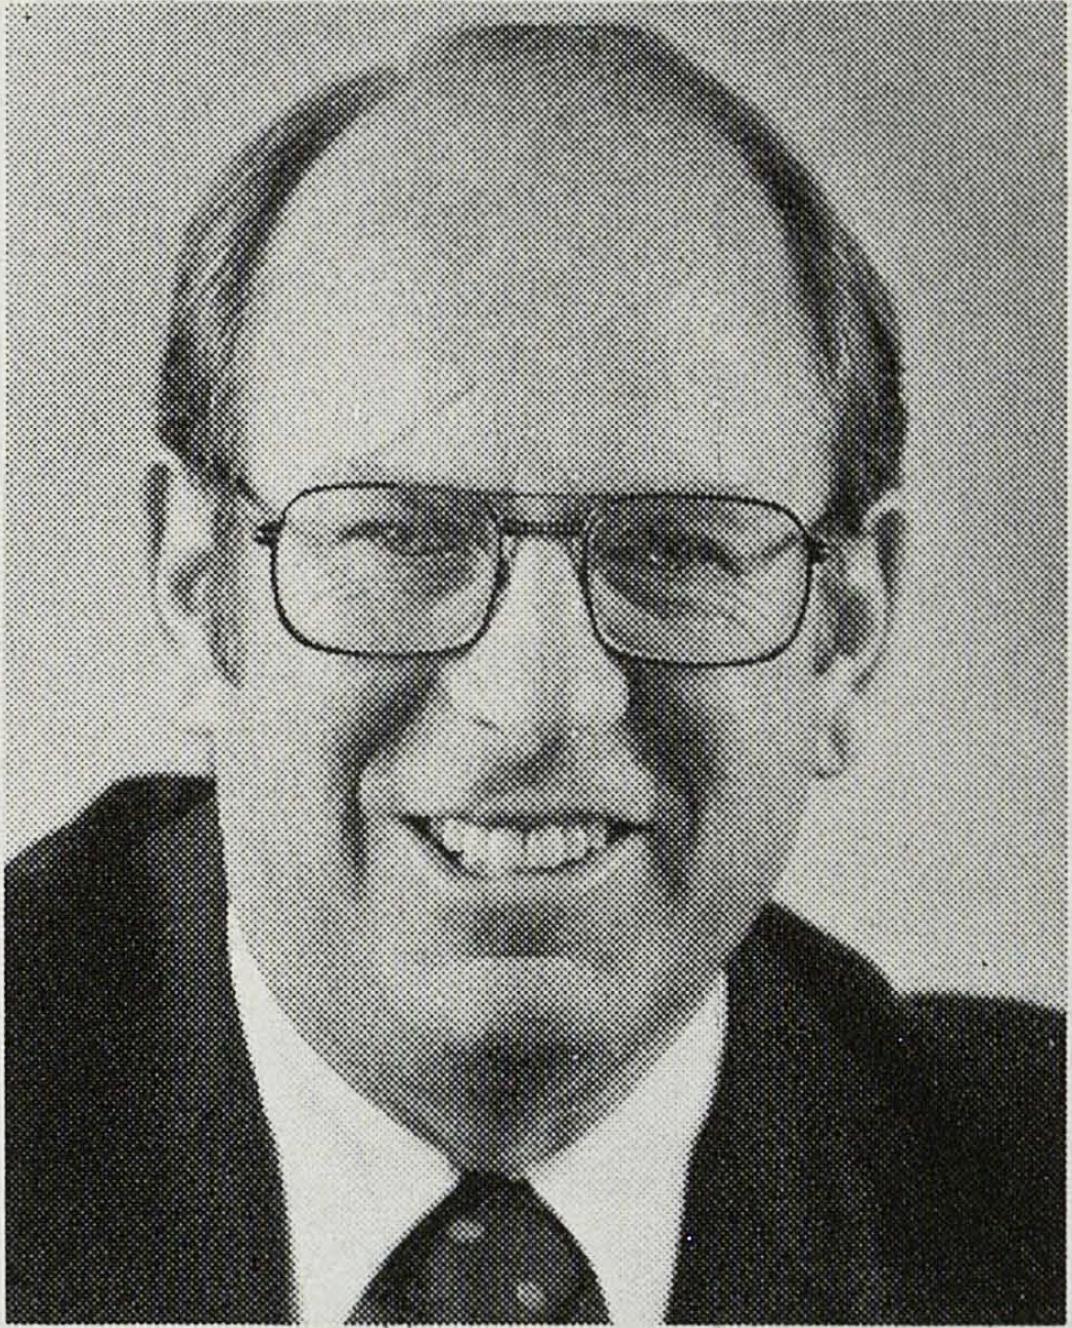 Dick Lowe